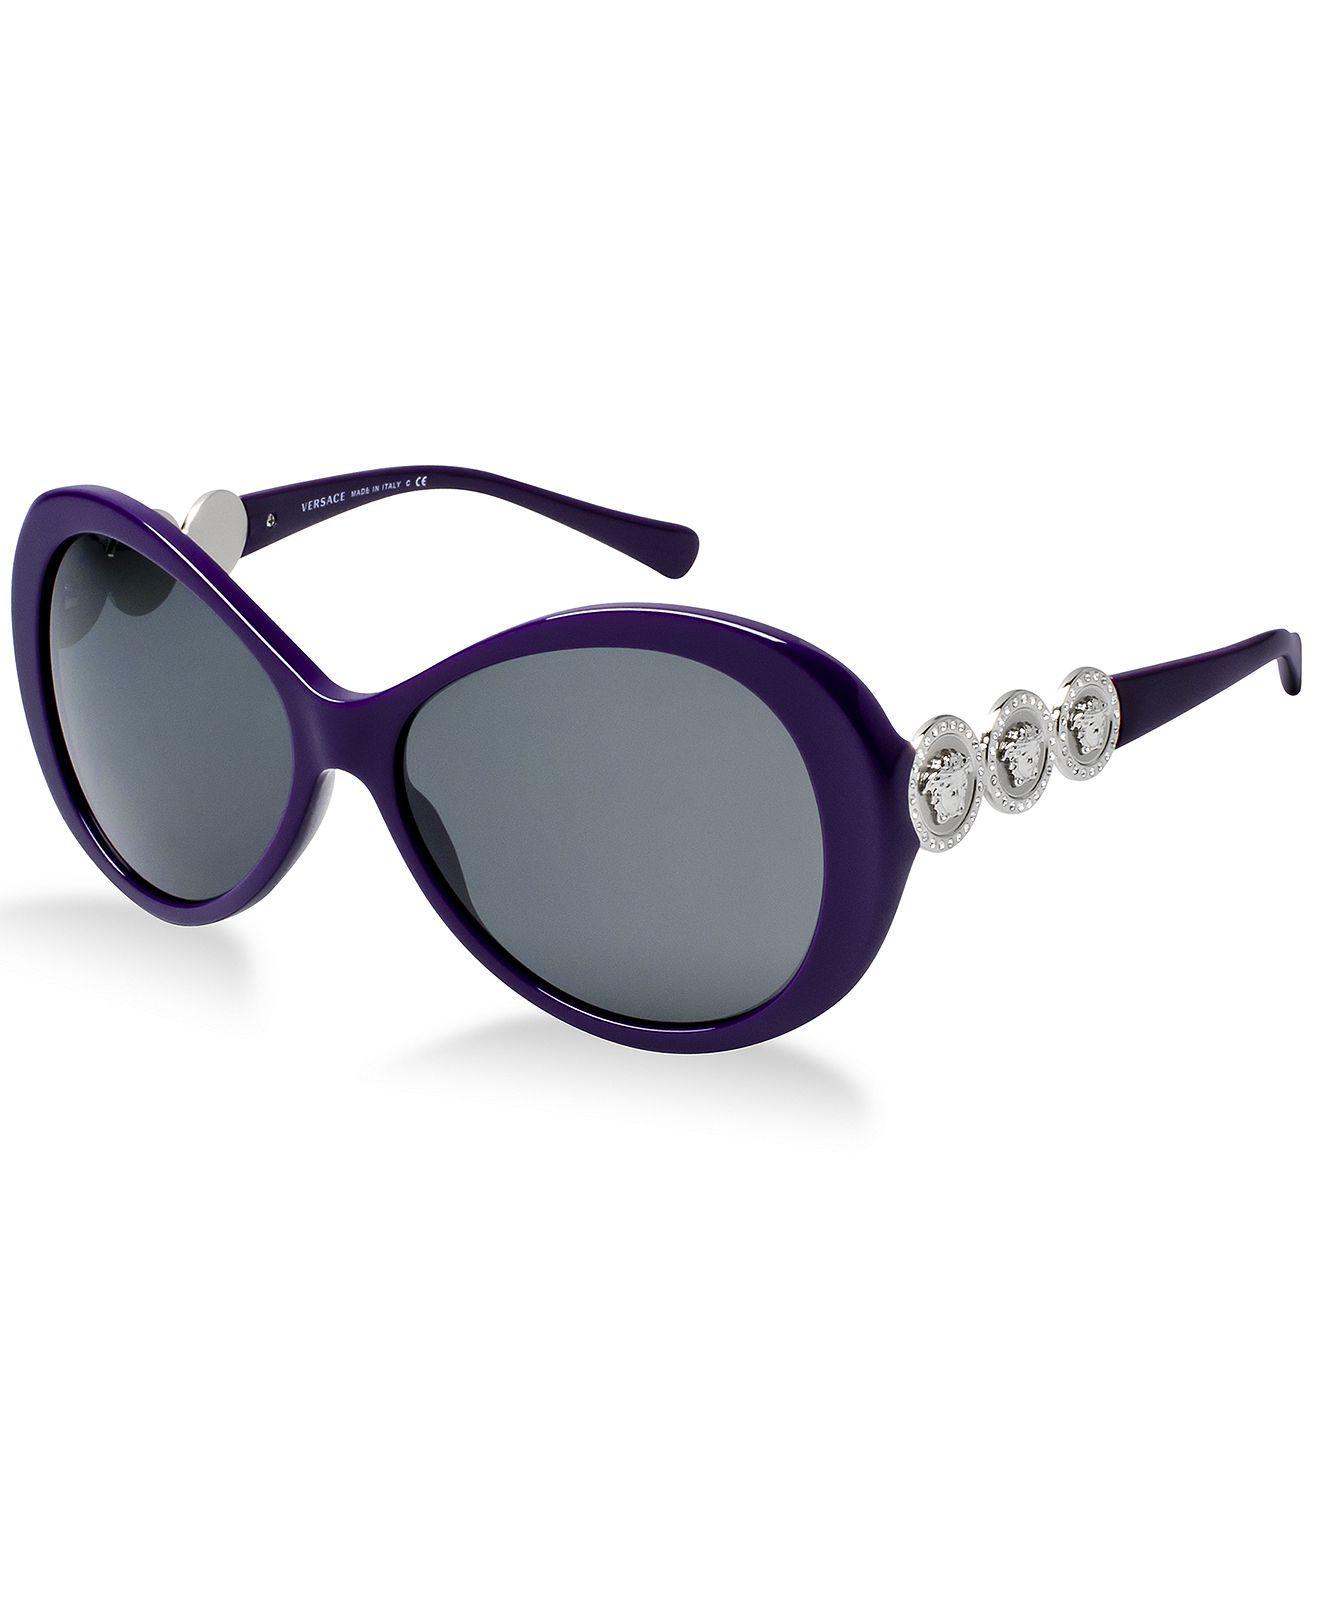 e477cb43d7b Versace Sunglasses - - Macy s Versace Sunglasses